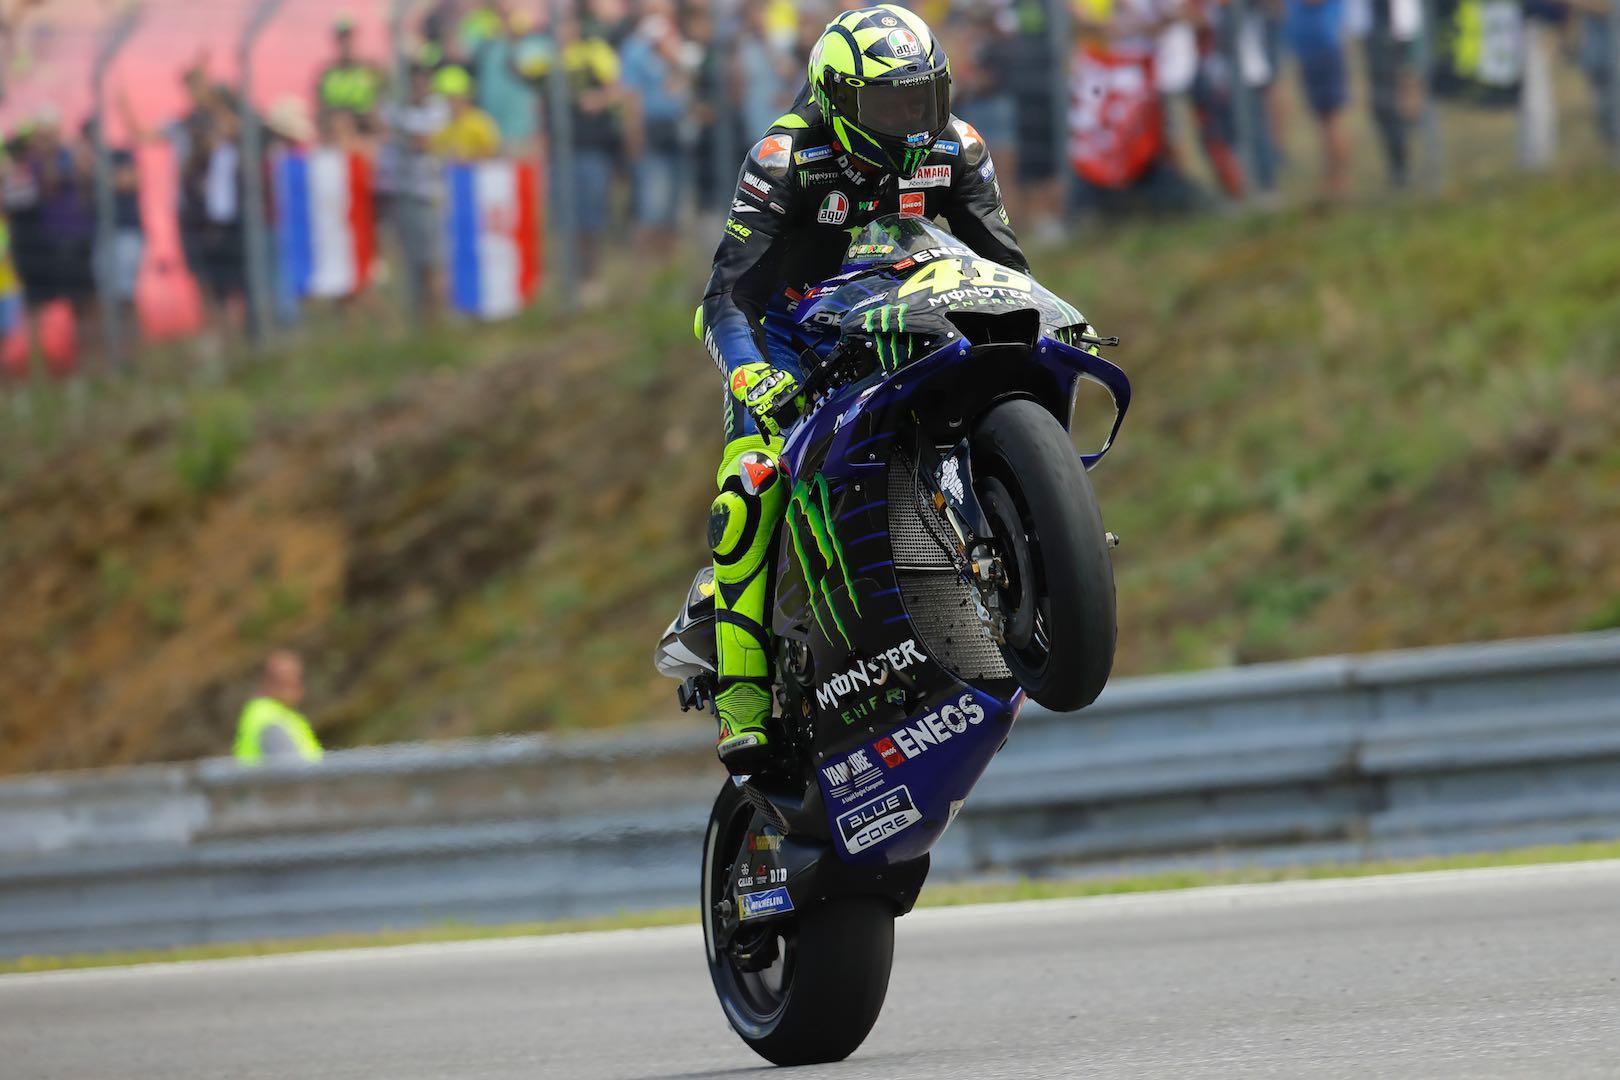 Valentino Rossi at Brno MotoGP 2019